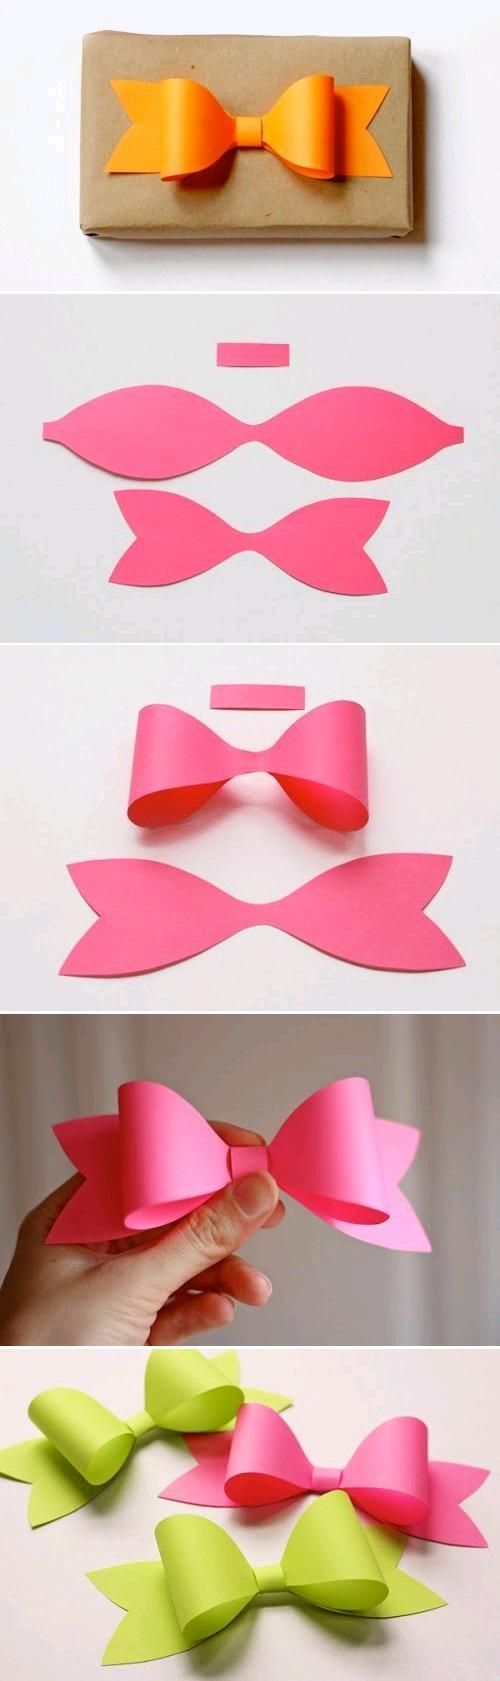 DIY Modular Gift Bow DIY Modular Gift Bow: